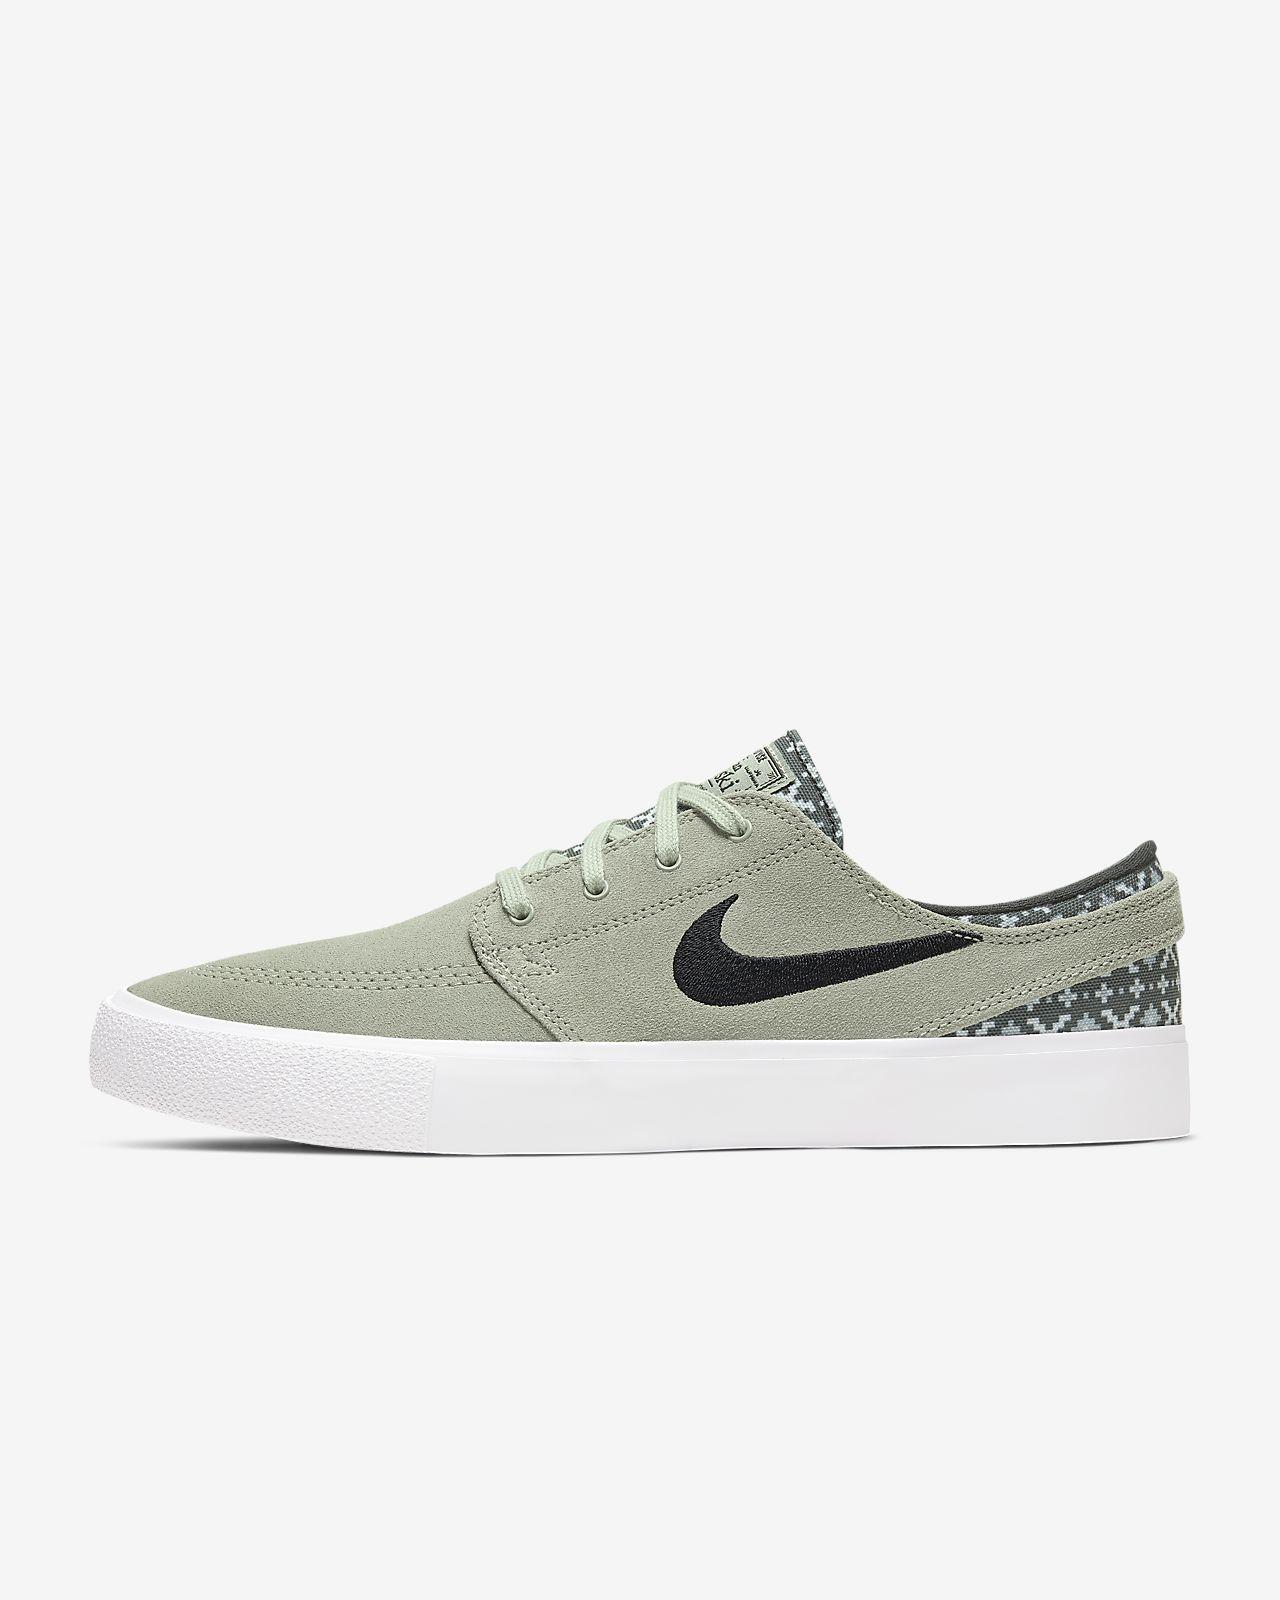 Nike SB Zoom Stefan Janoski RM Premium Sabatilles de skateboard